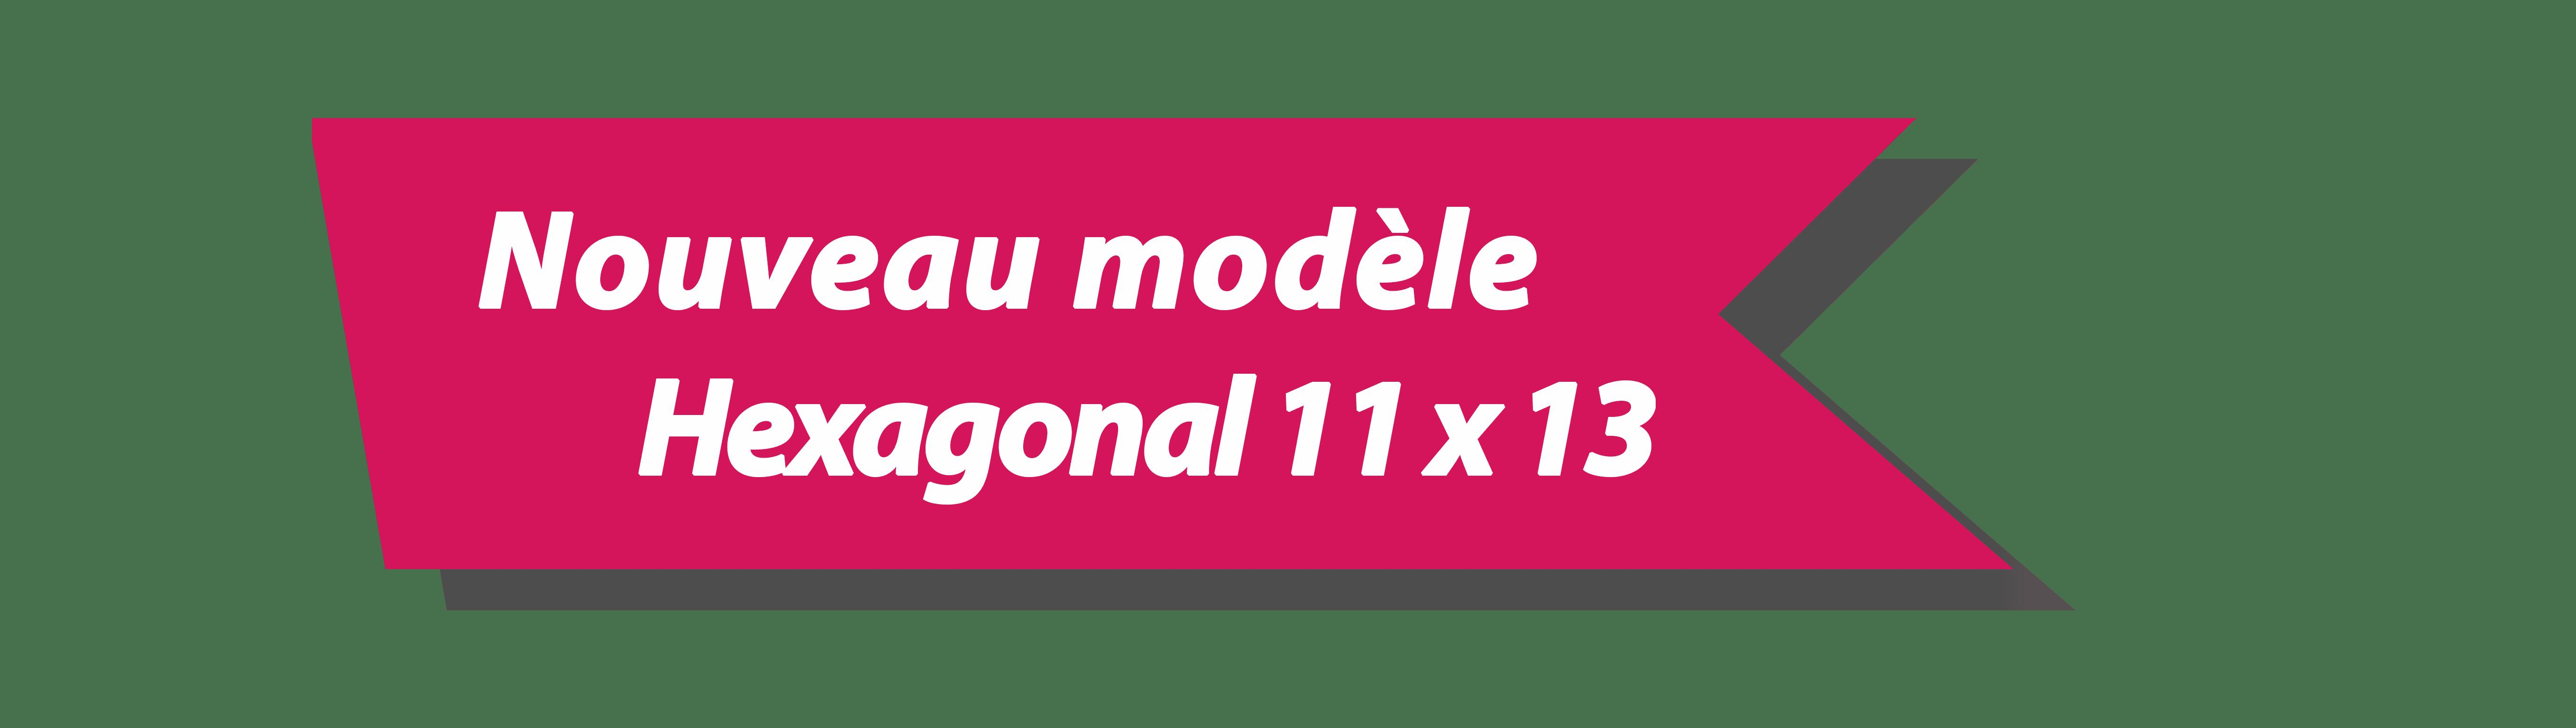 Hexagonal 11x13